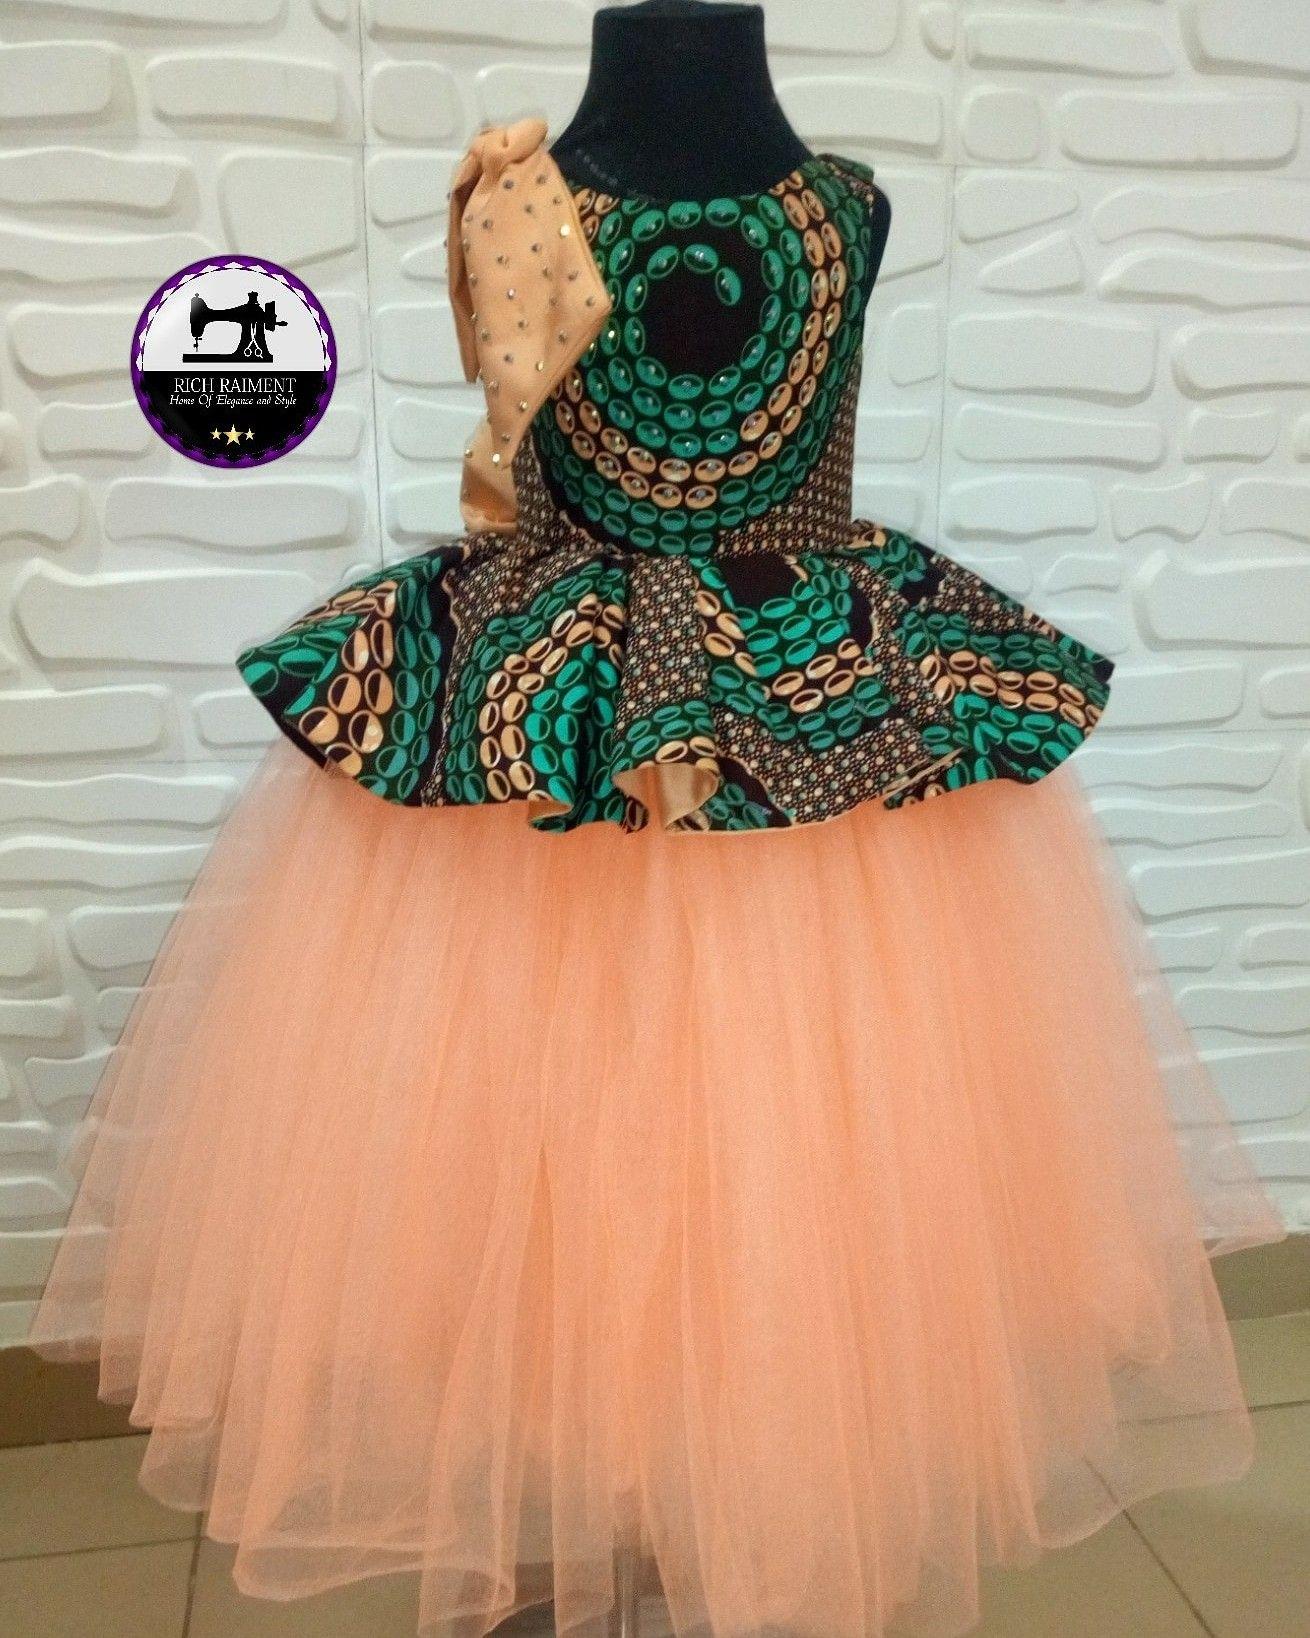 7e7108d637 Ankara inspired girls ball dress | Ankara tutu ball dress in 2019 ...